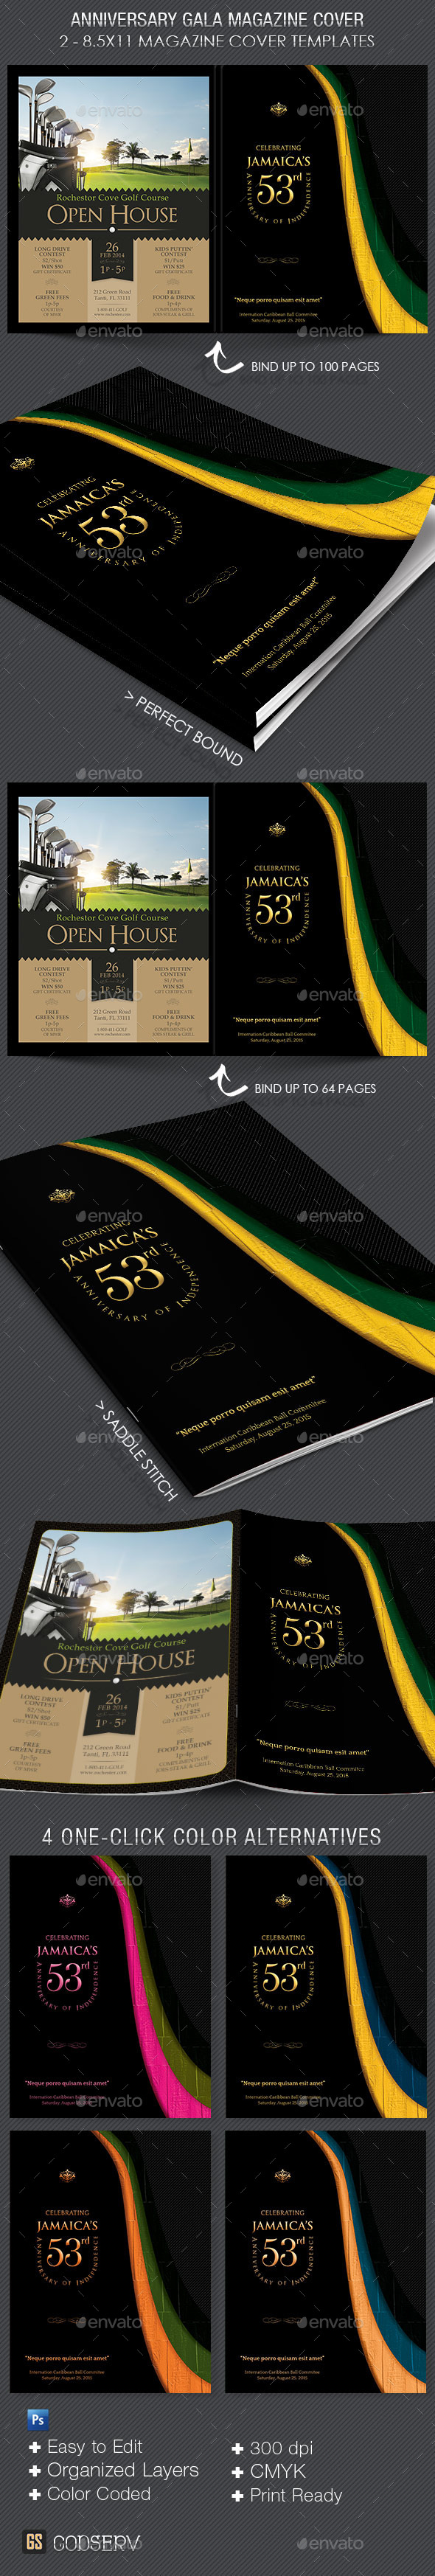 Anniversary Gala Magazine Cover Template - Magazines Print Templates